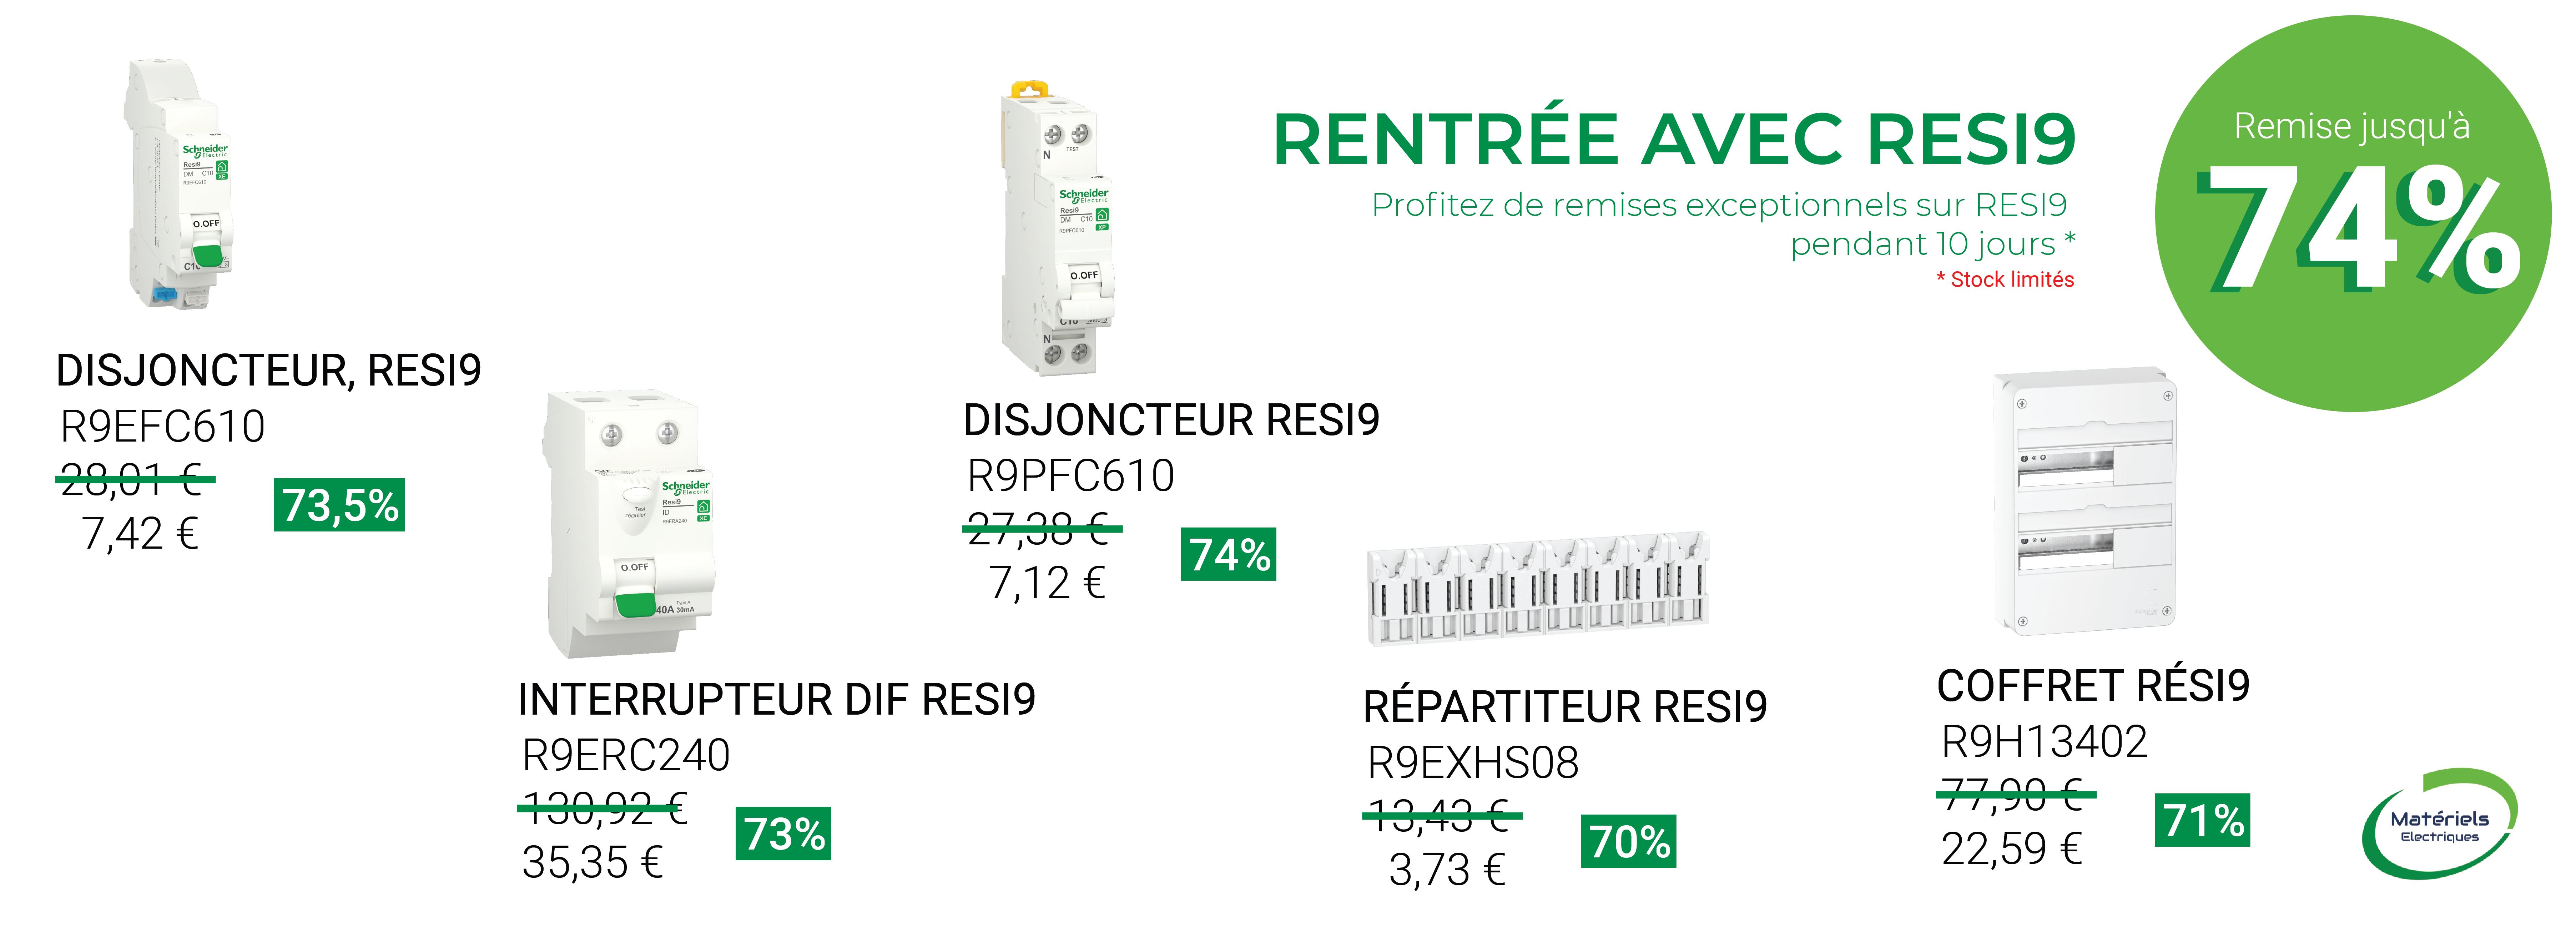 RENTRÉE AVEC RESI9